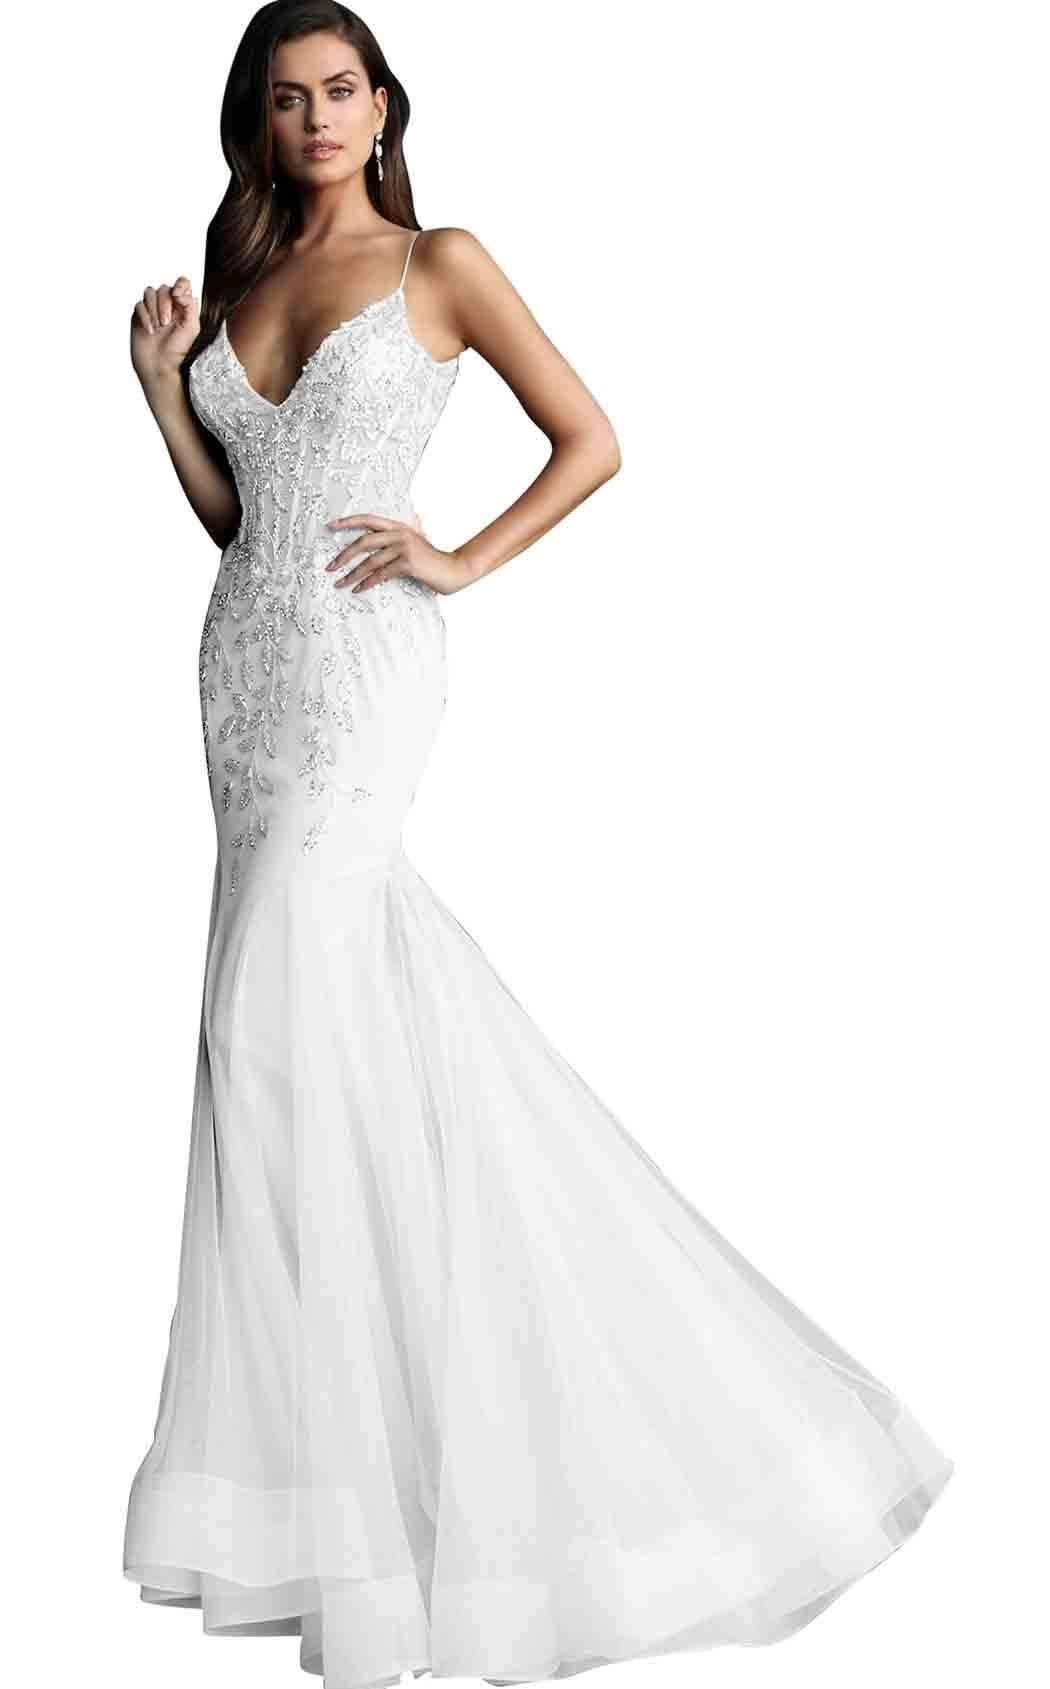 c20892b9766 Jovani 63704 Corset V Neck Spaghetti Strap Mermaid Prom Dress in ...